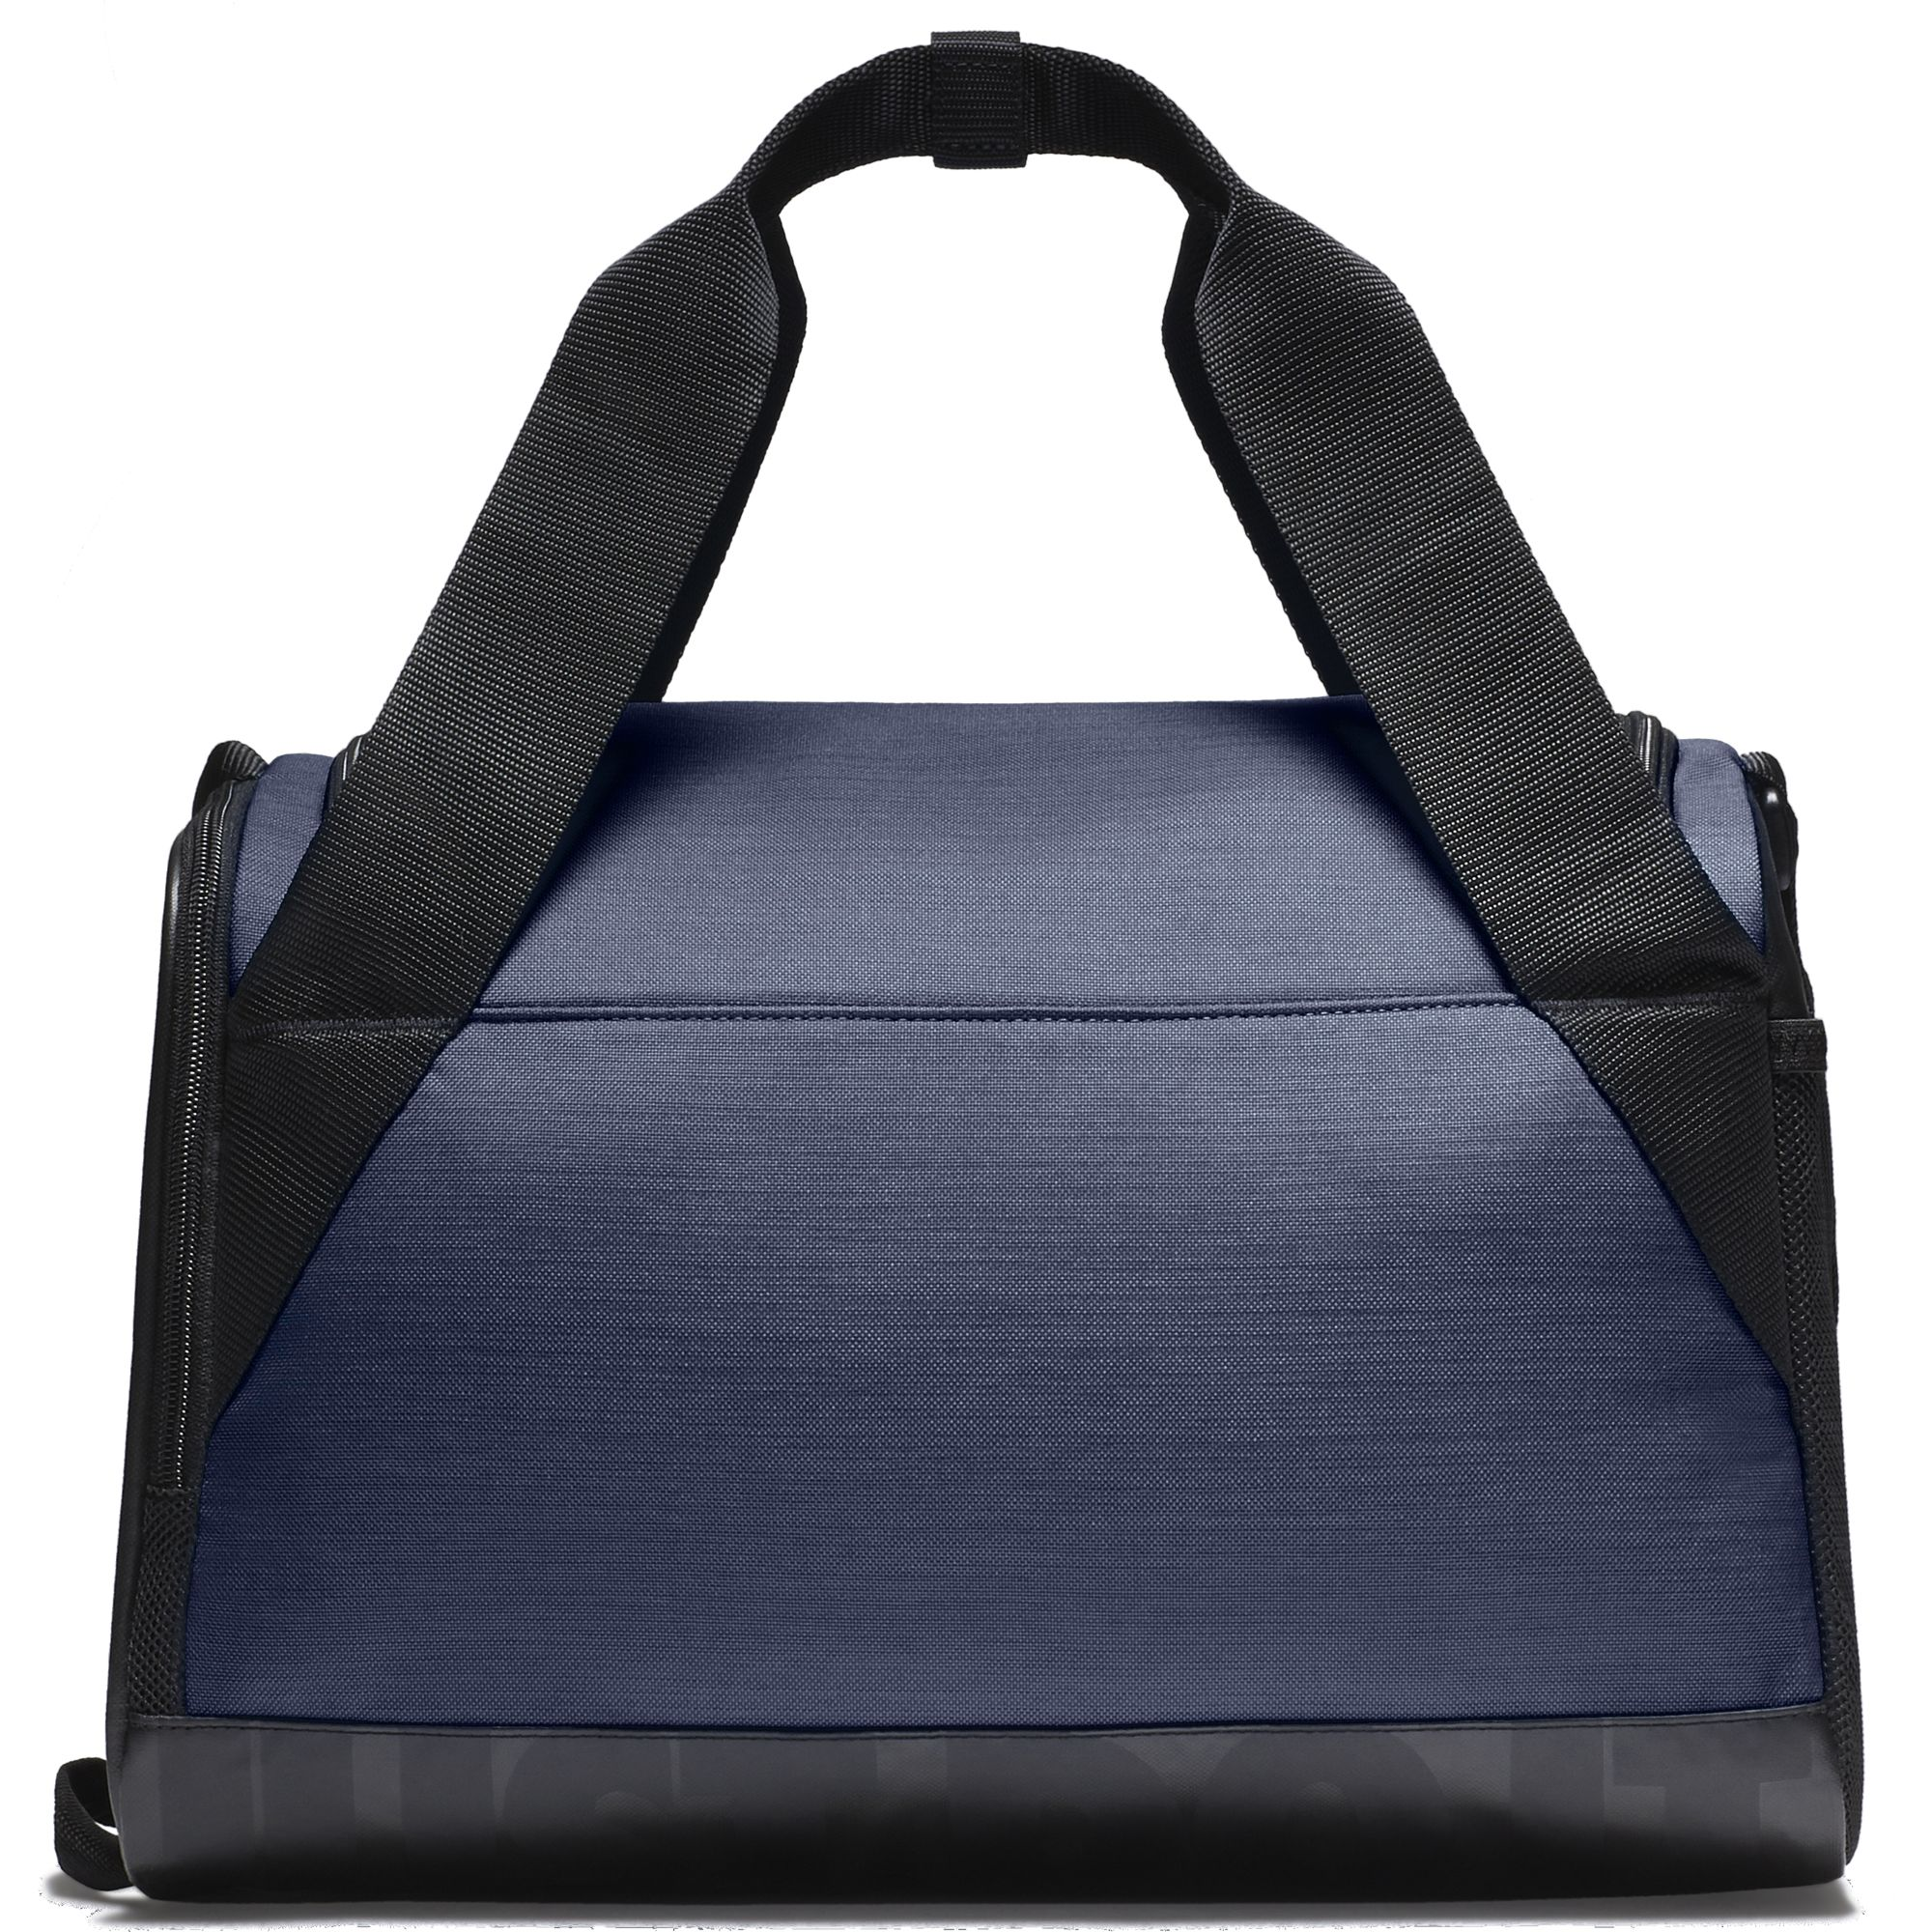 4bde616430d77 ... torba Nike Brasilia (Extra-Small) Duffel Bag BA5432 410 ...